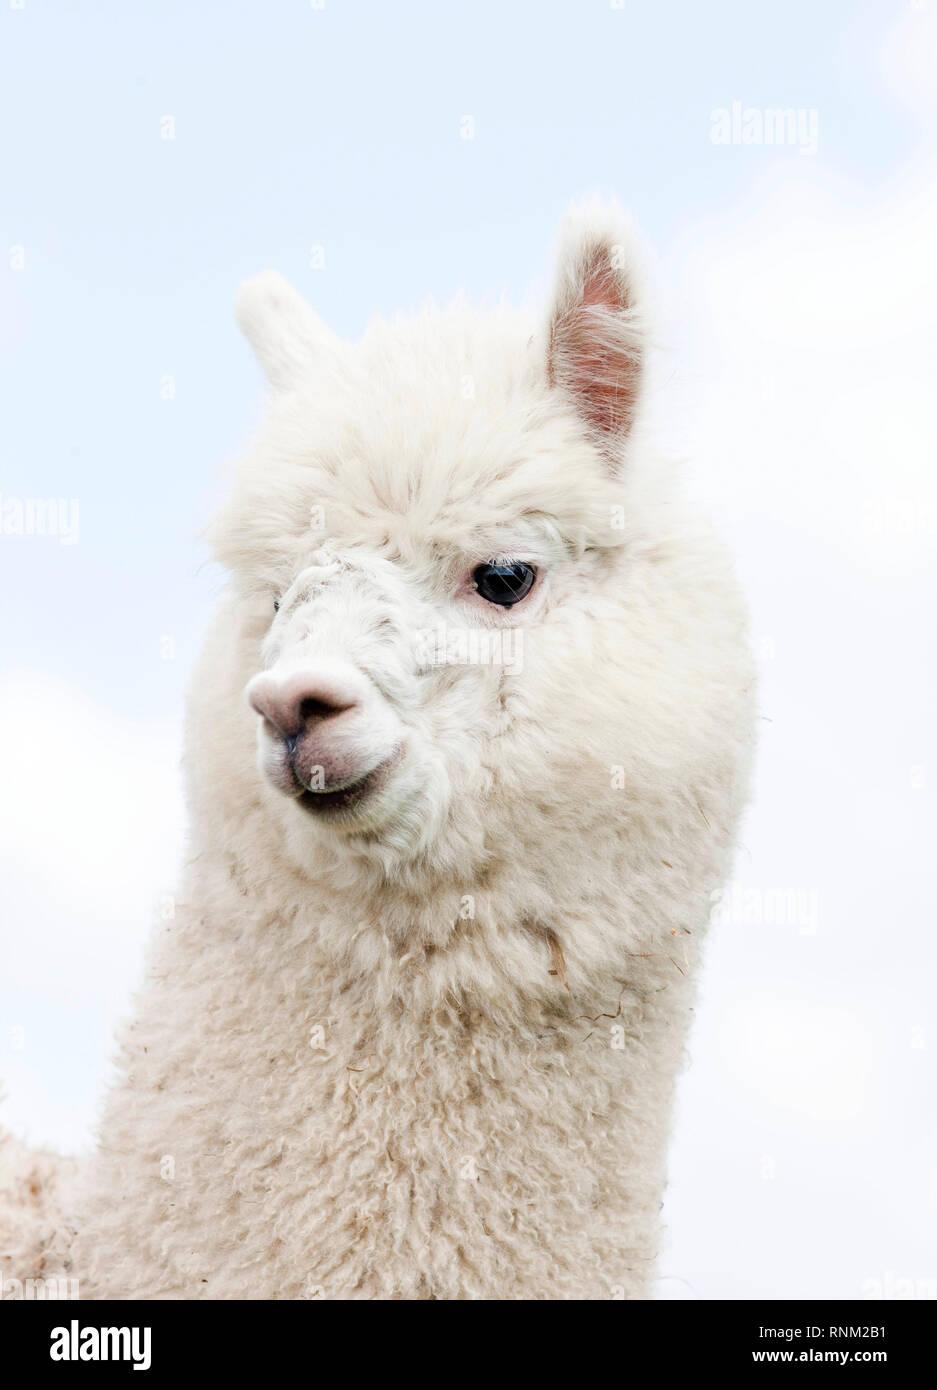 Alpaca (Vicugna pacos), portrait of adult. Germany - Stock Image